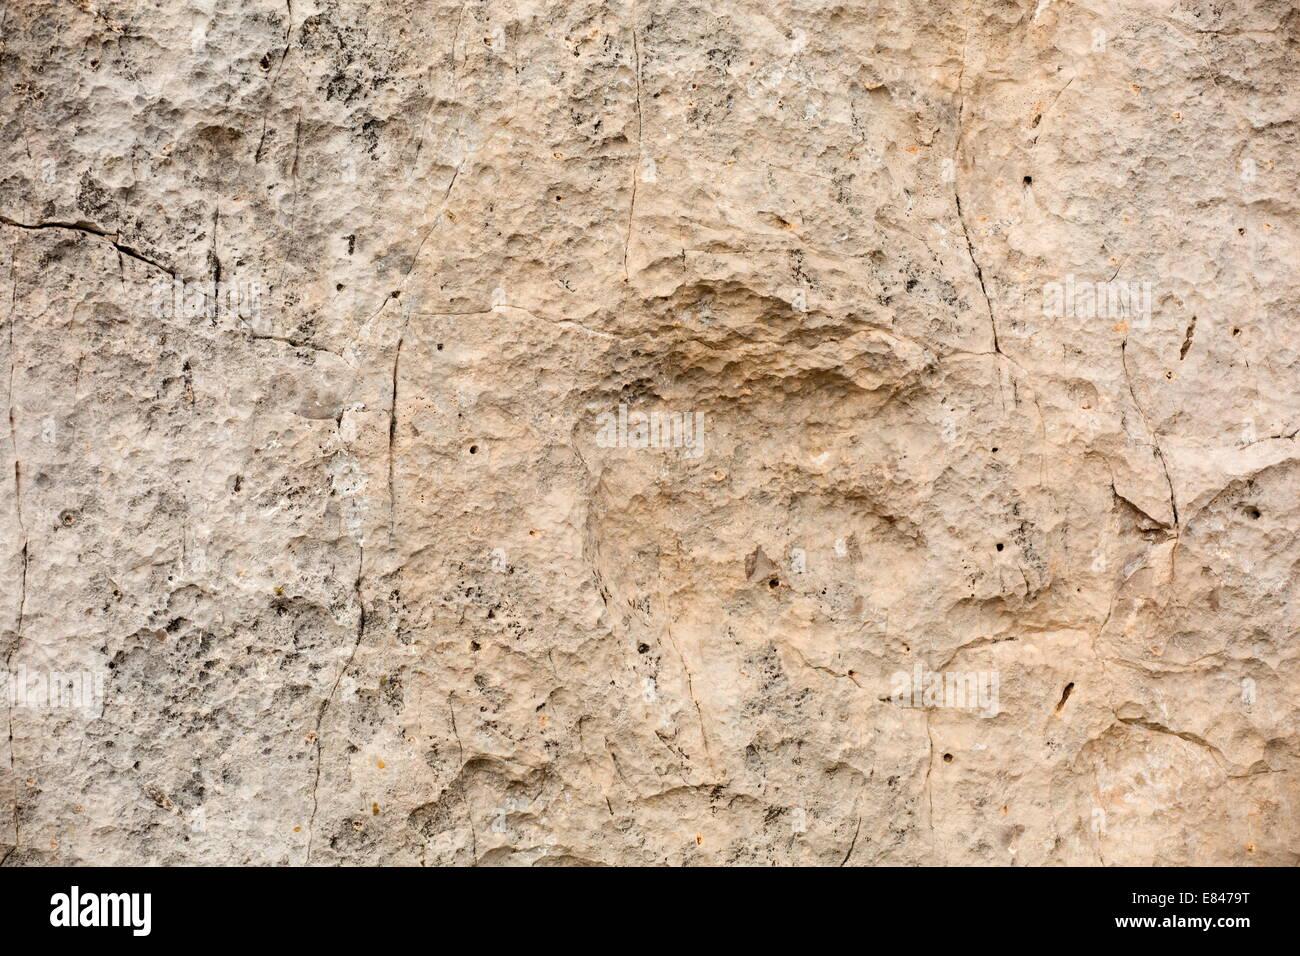 Dinosaur footprint, 200 myo Eubrontes sp, Dolomites, Italy - Stock Image